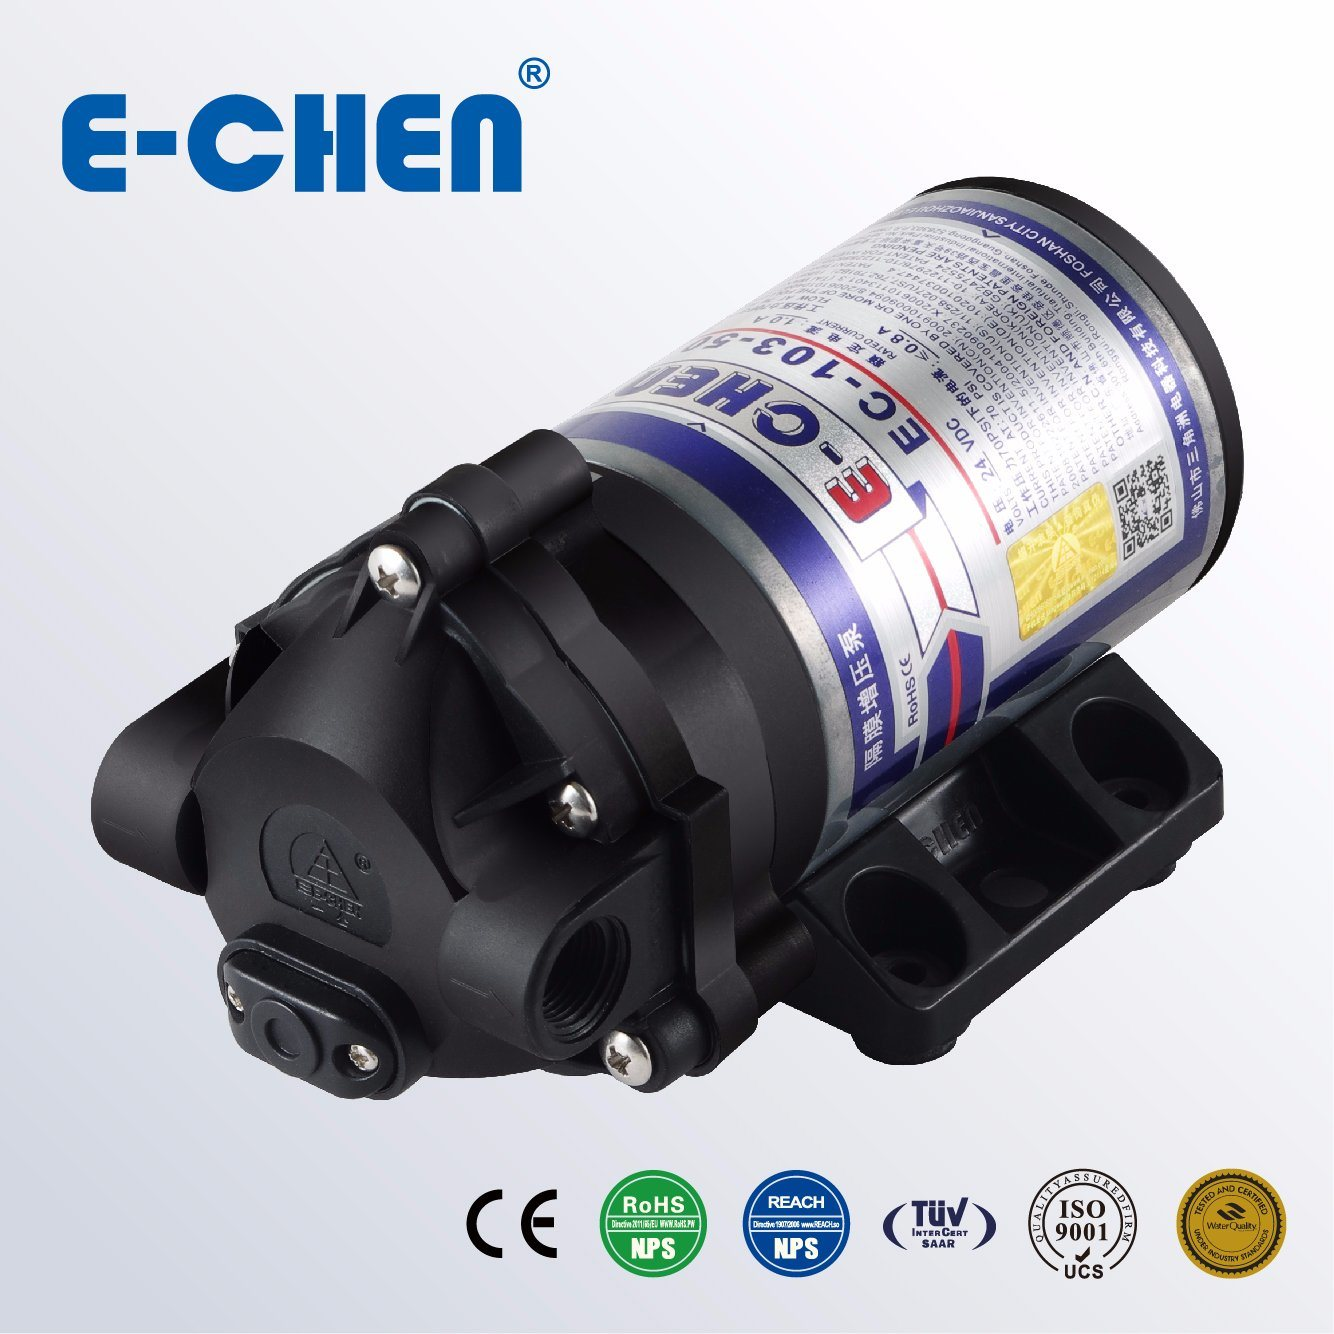 E-Chen RO Booster Pump 200gpd 1.6 L/M Home Reverse Osmosis Ec103 **Excellent**